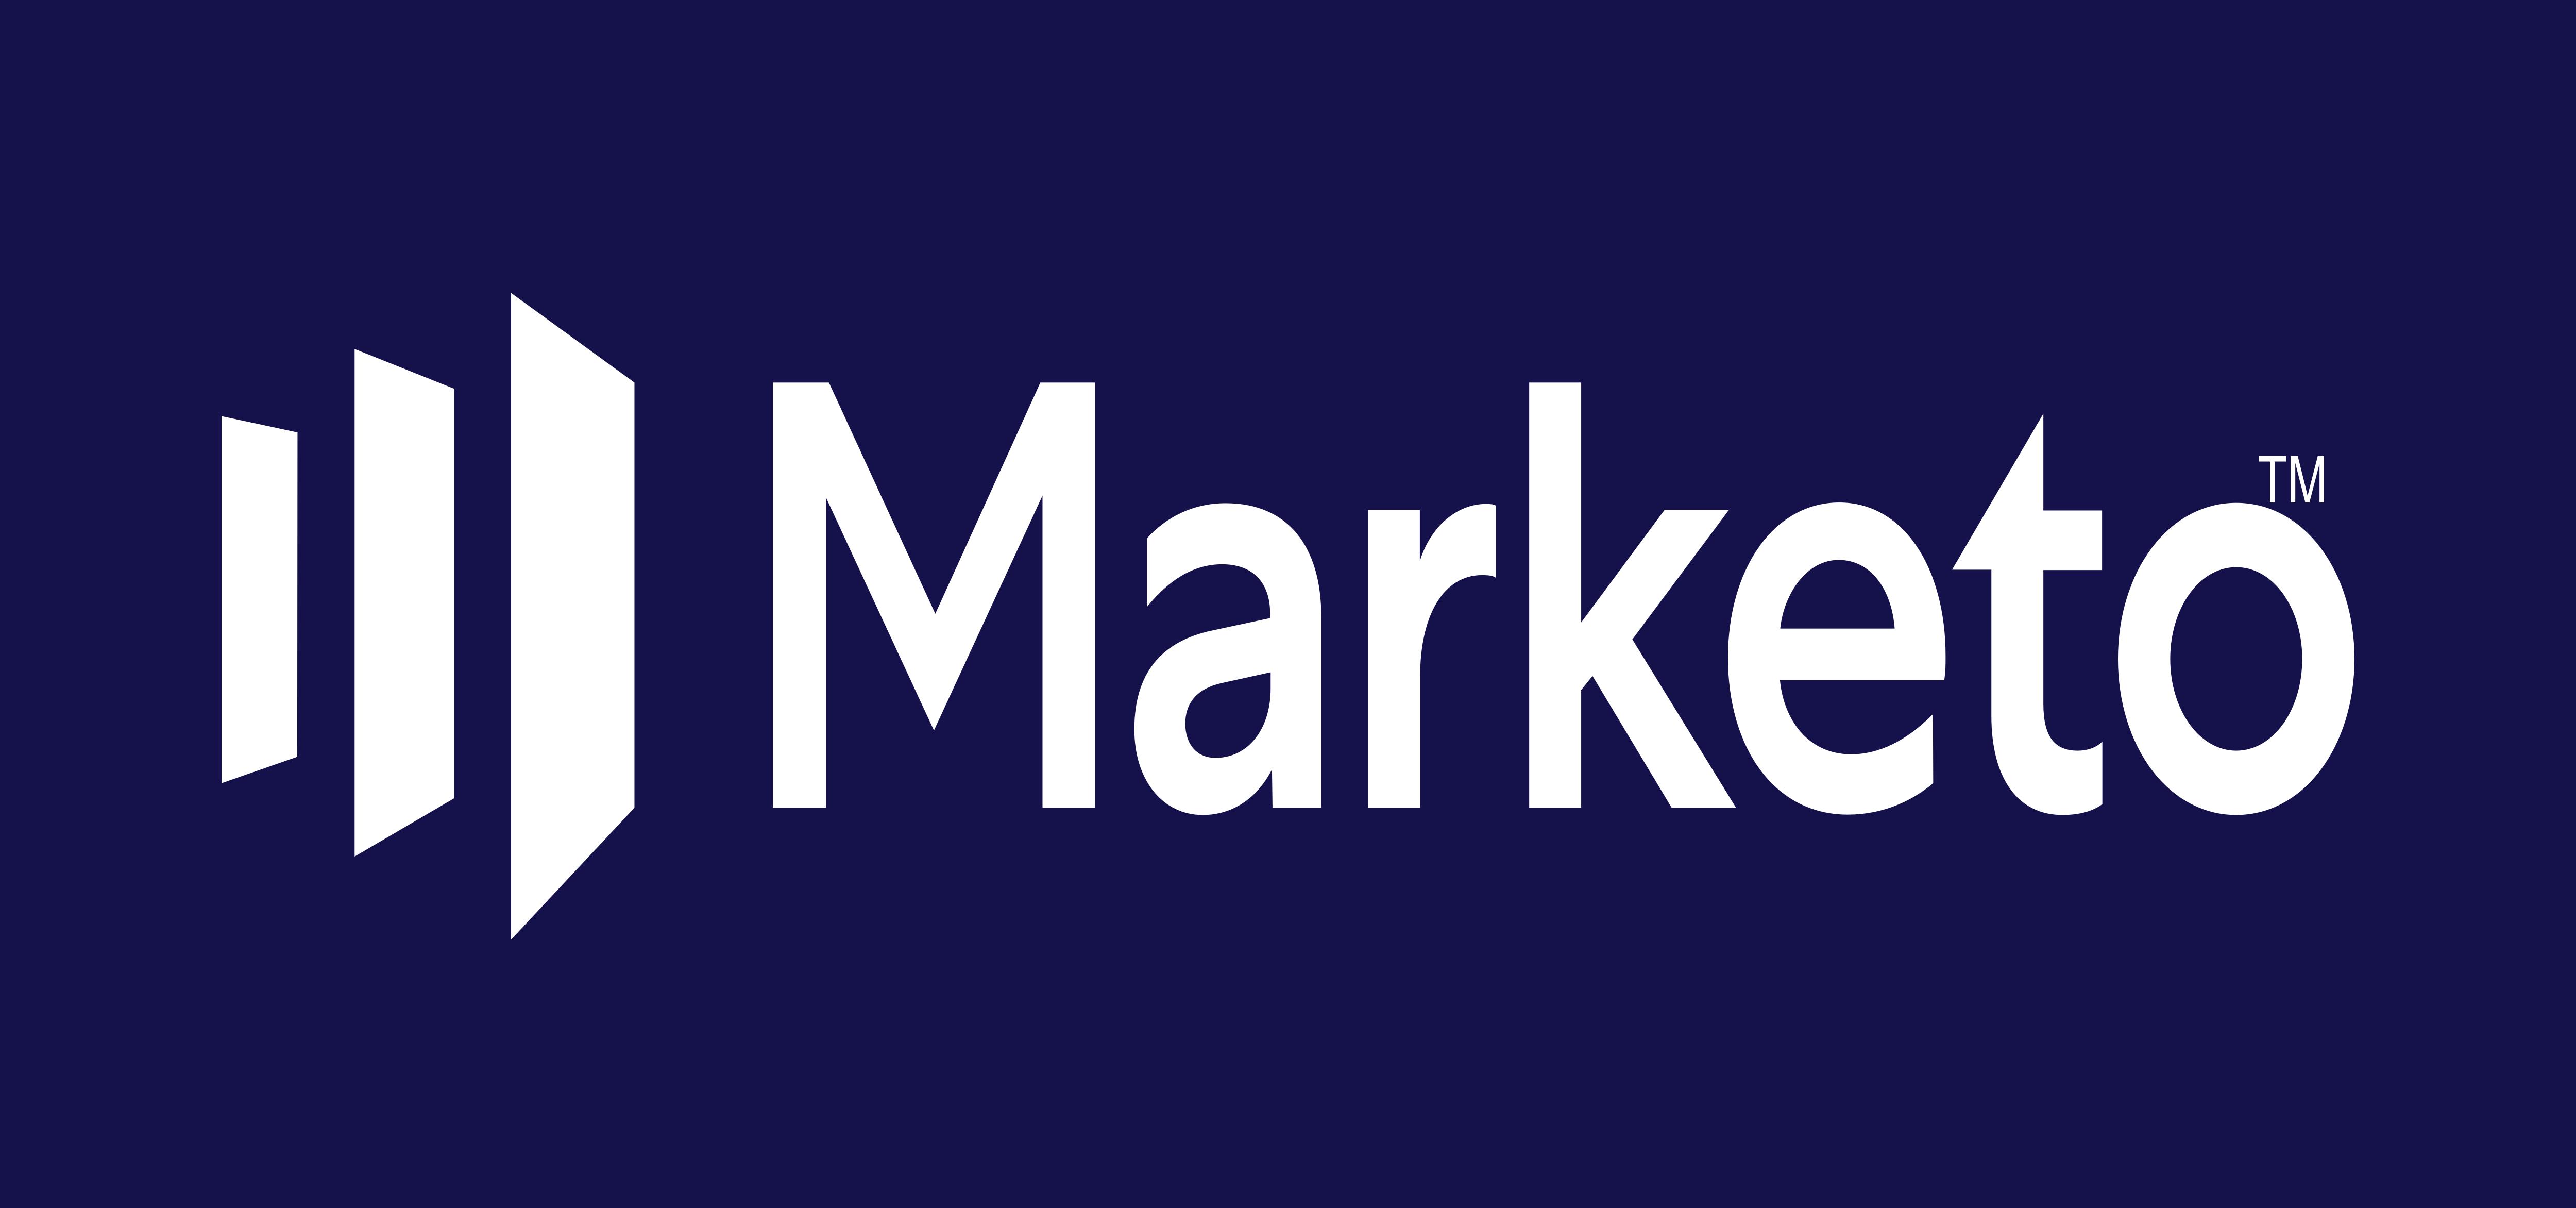 Marketo | Nagarro | Partner